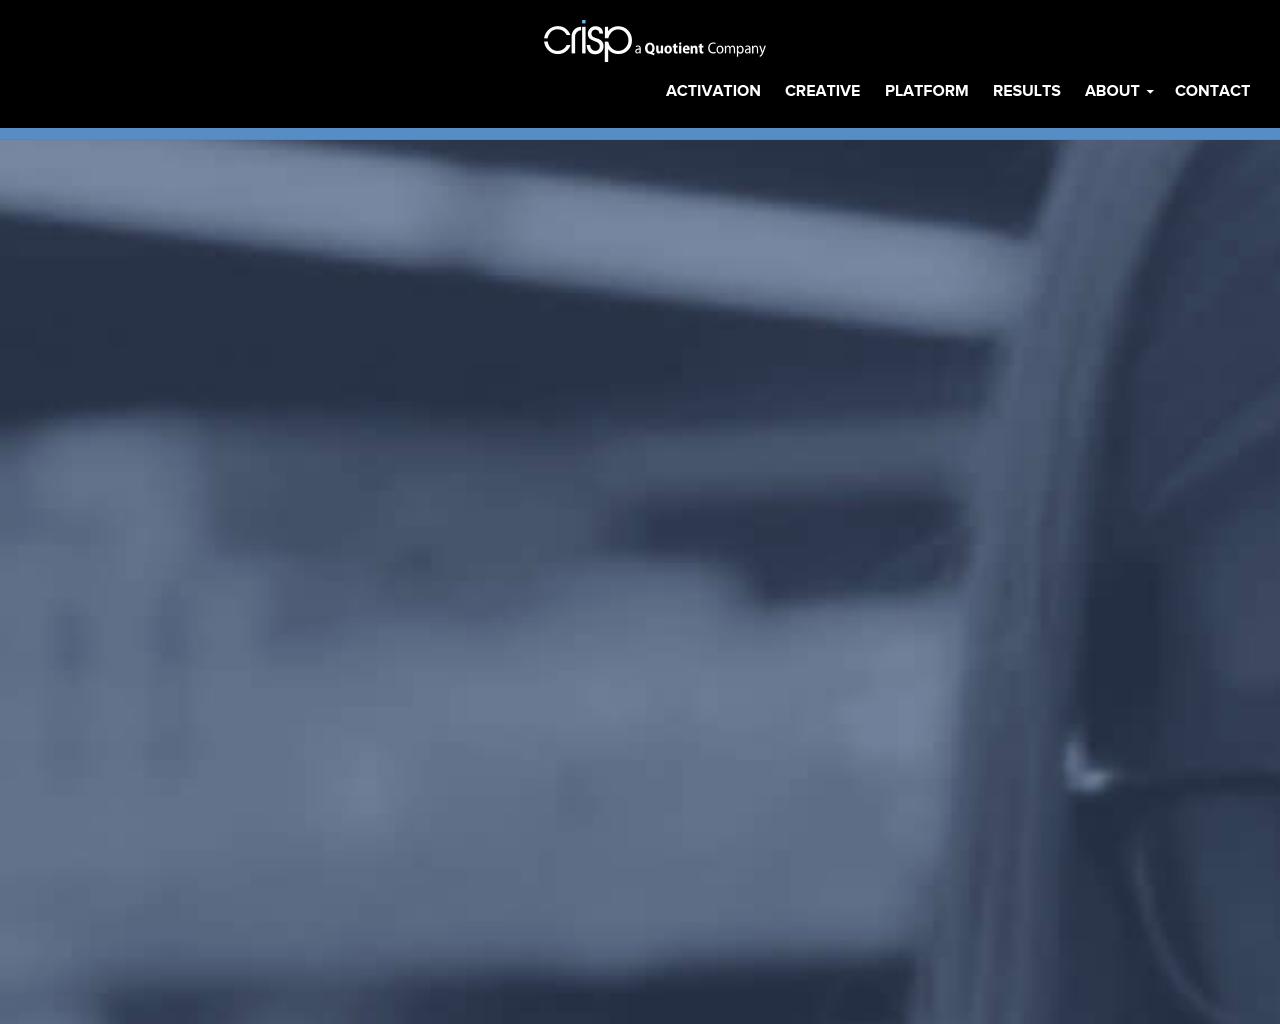 Crisp-Mobile-Advertising-Reviews-Pricing